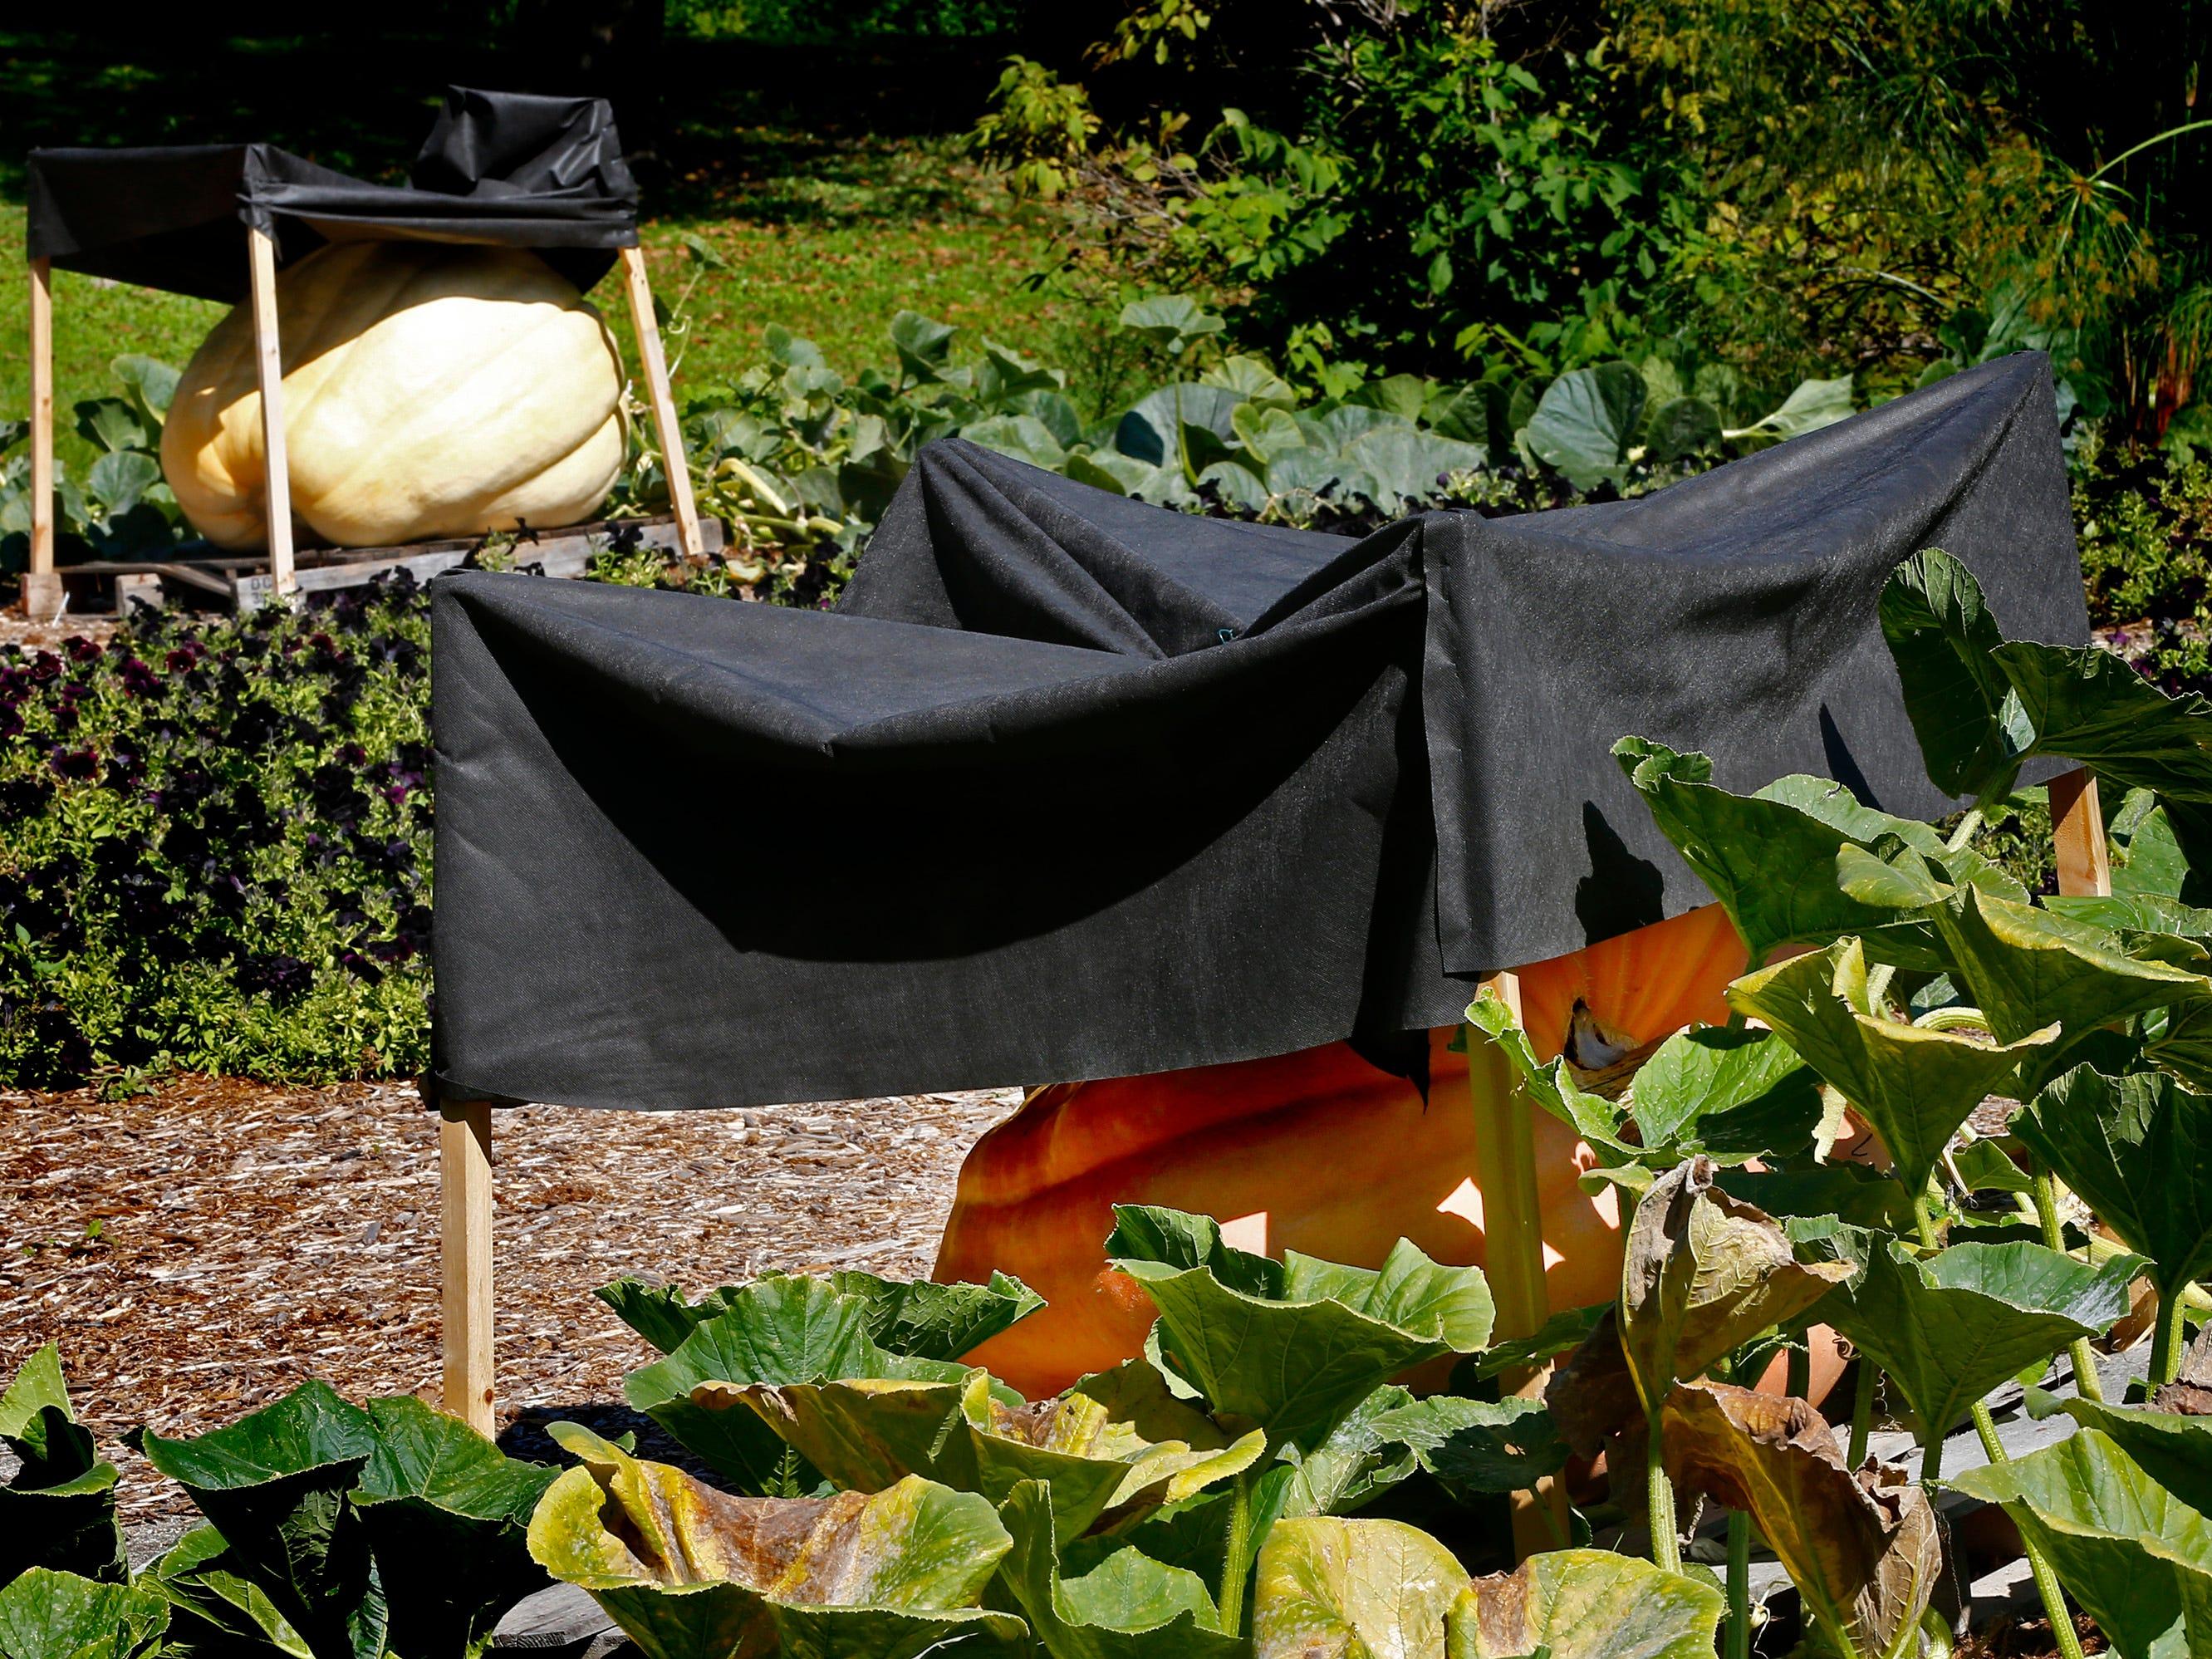 Six giant pumpkins grow beneath sun shades in a park garden east of Broad Street in Greendale.